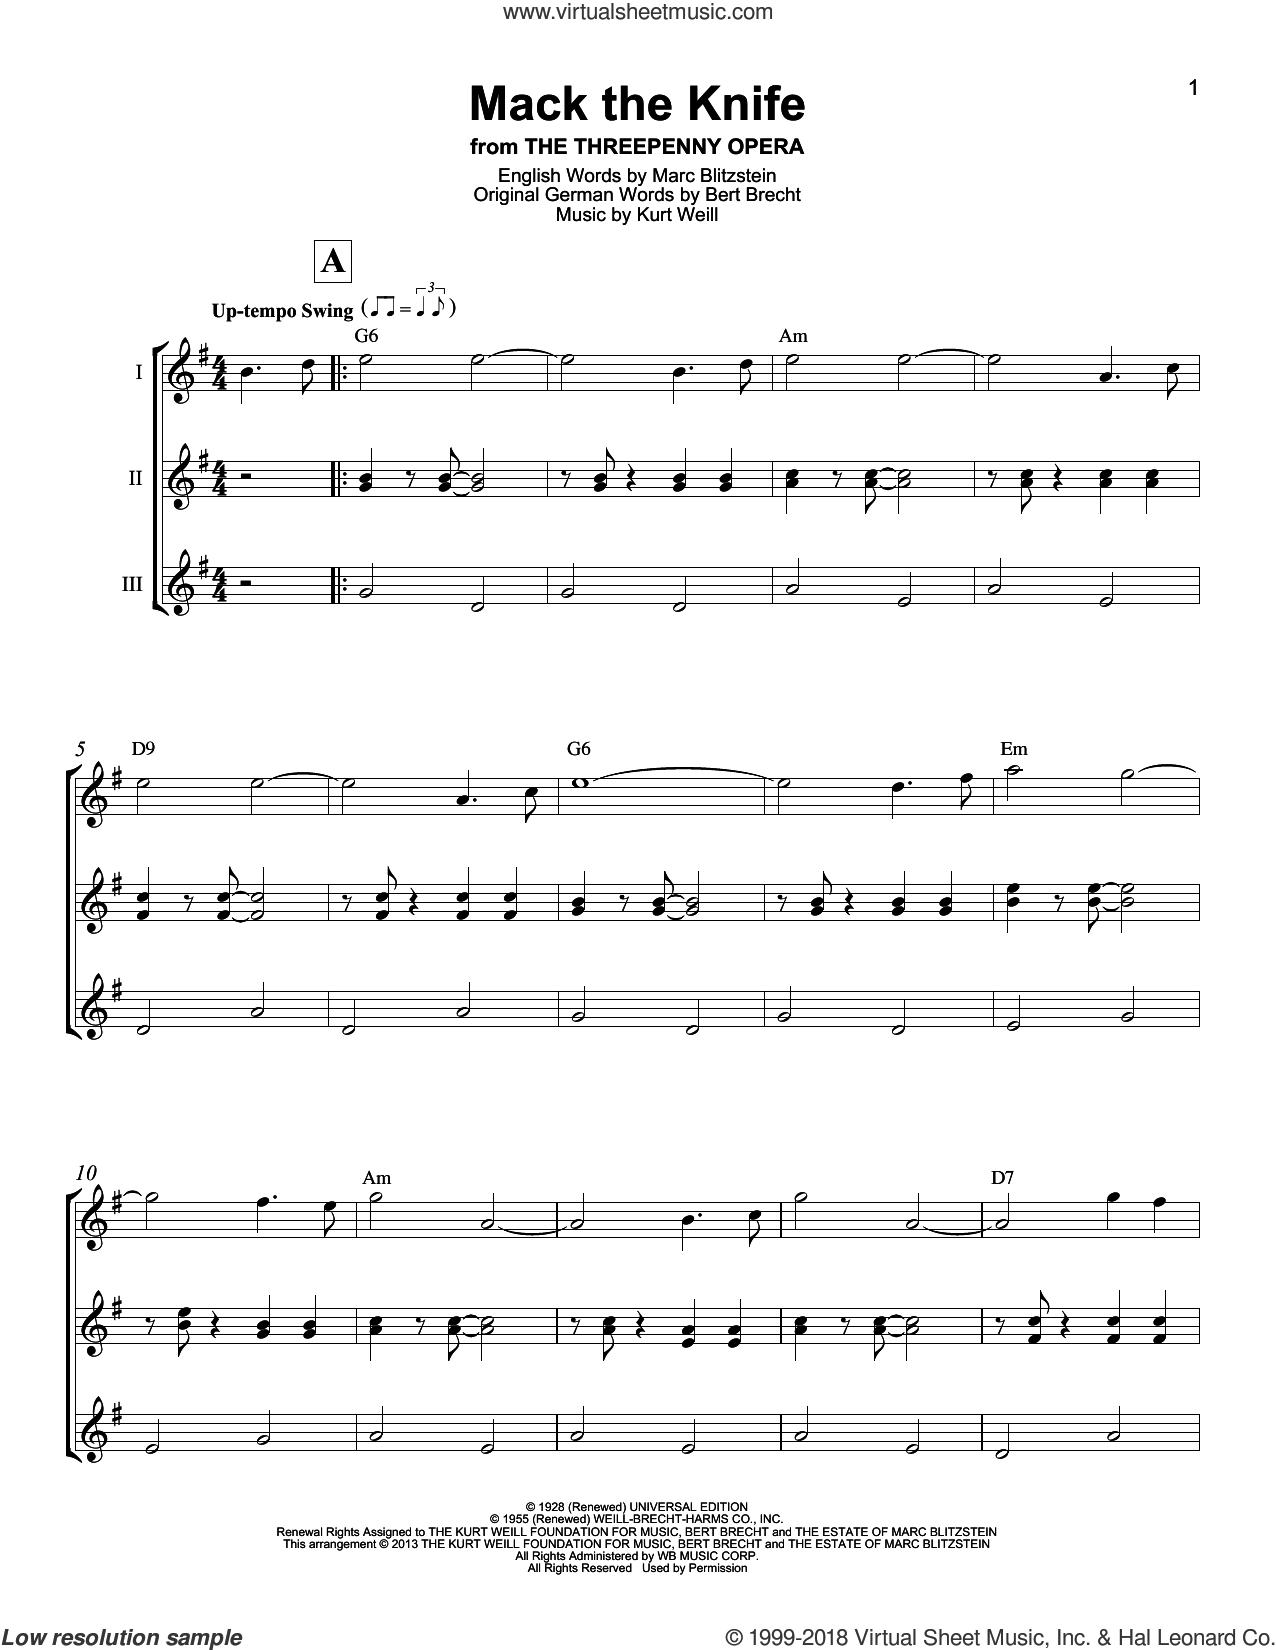 Mack The Knife sheet music for ukulele ensemble by Bobby Darin, Bertolt Brecht, Kurt Weill and Marc Blitzstein, intermediate skill level